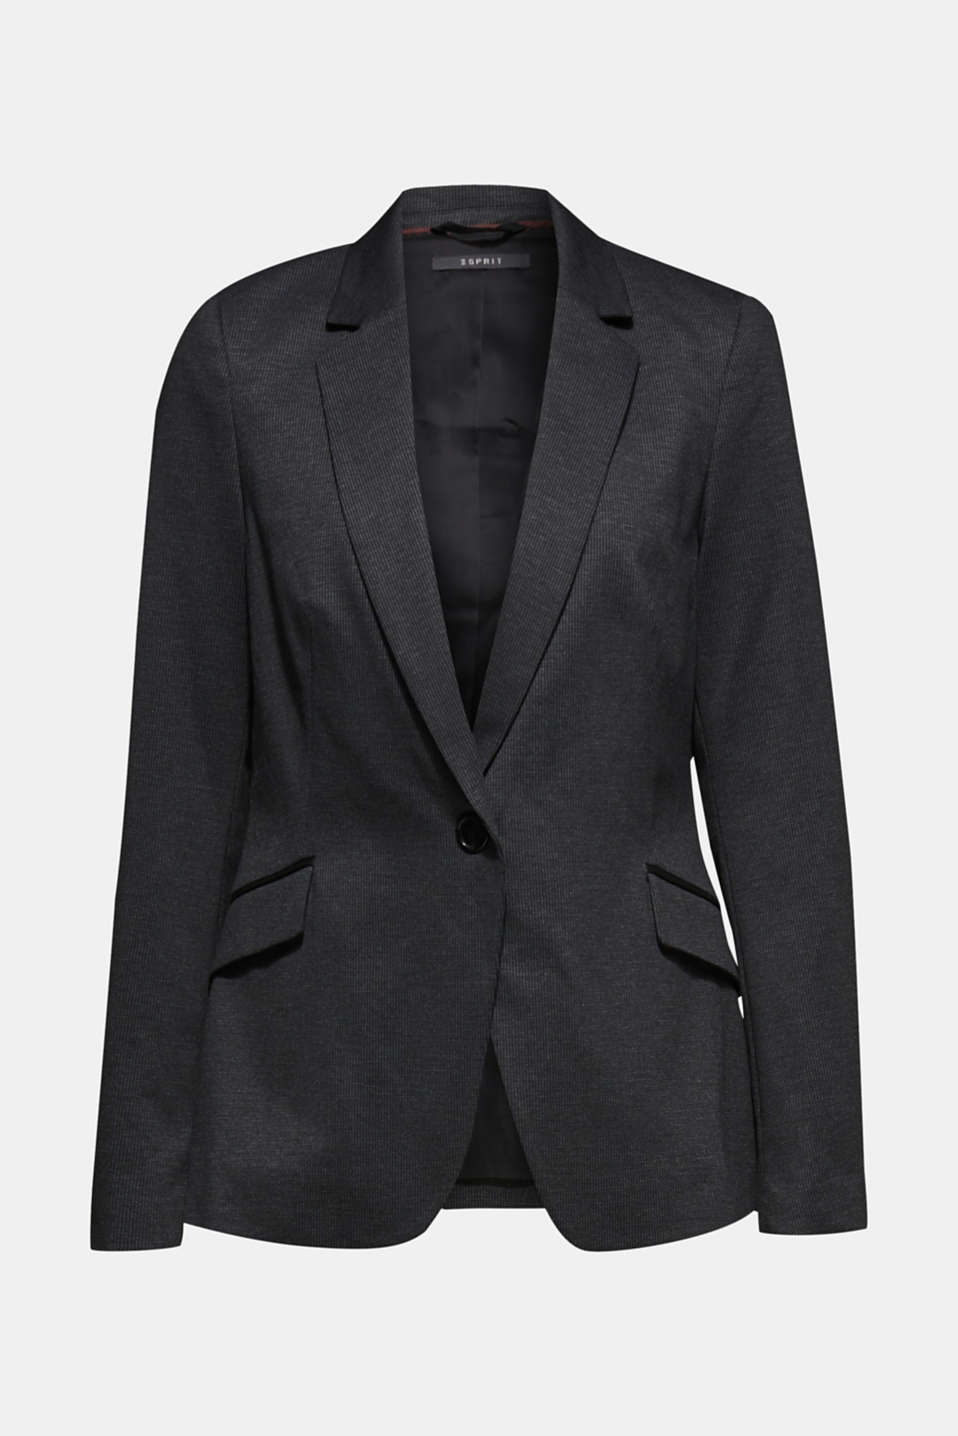 MINI CHECK mix + match stretch blazer, ANTHRACITE, detail image number 6